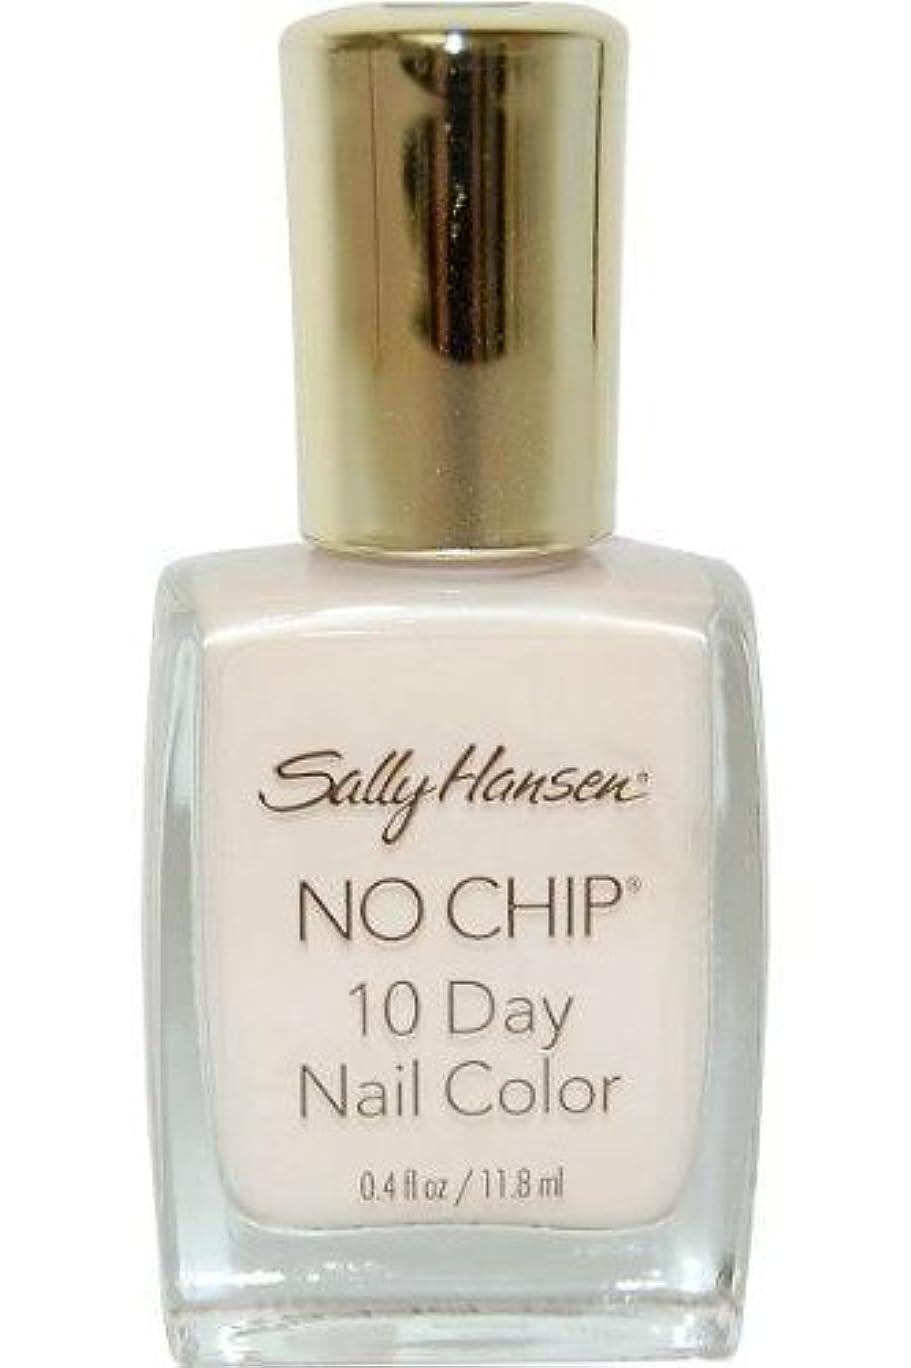 SALLY HANSEN NO CHIP 10 DAY NAIL COLOR #4840-25 LASTING LILY